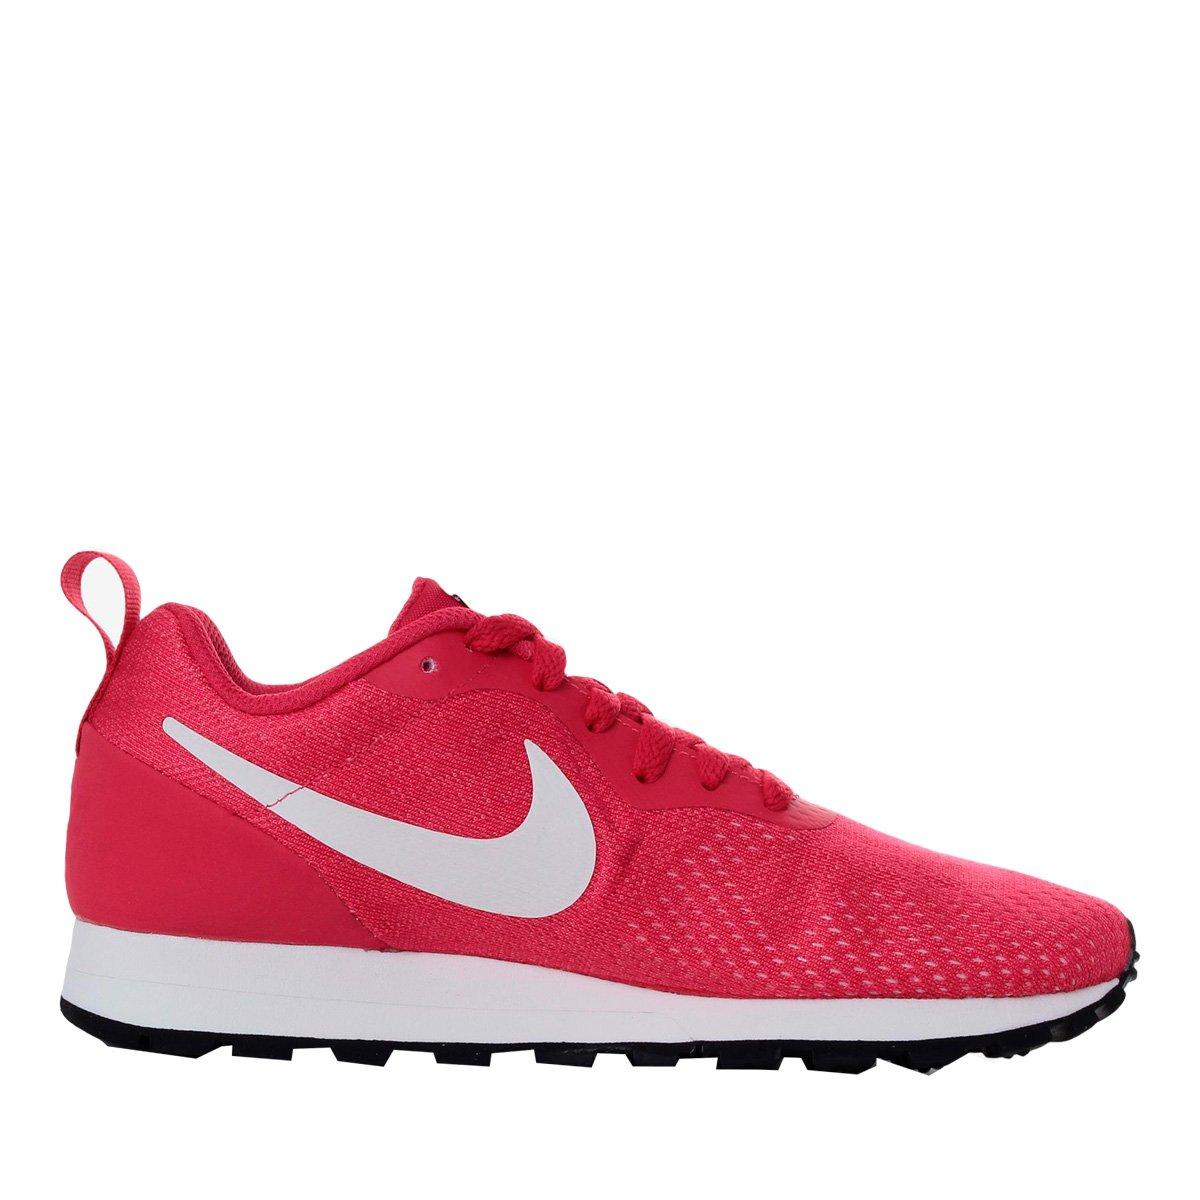 9980f124c2 Bizz Store - Tênis Feminino Nike MD Runner 2 Eng Mesh